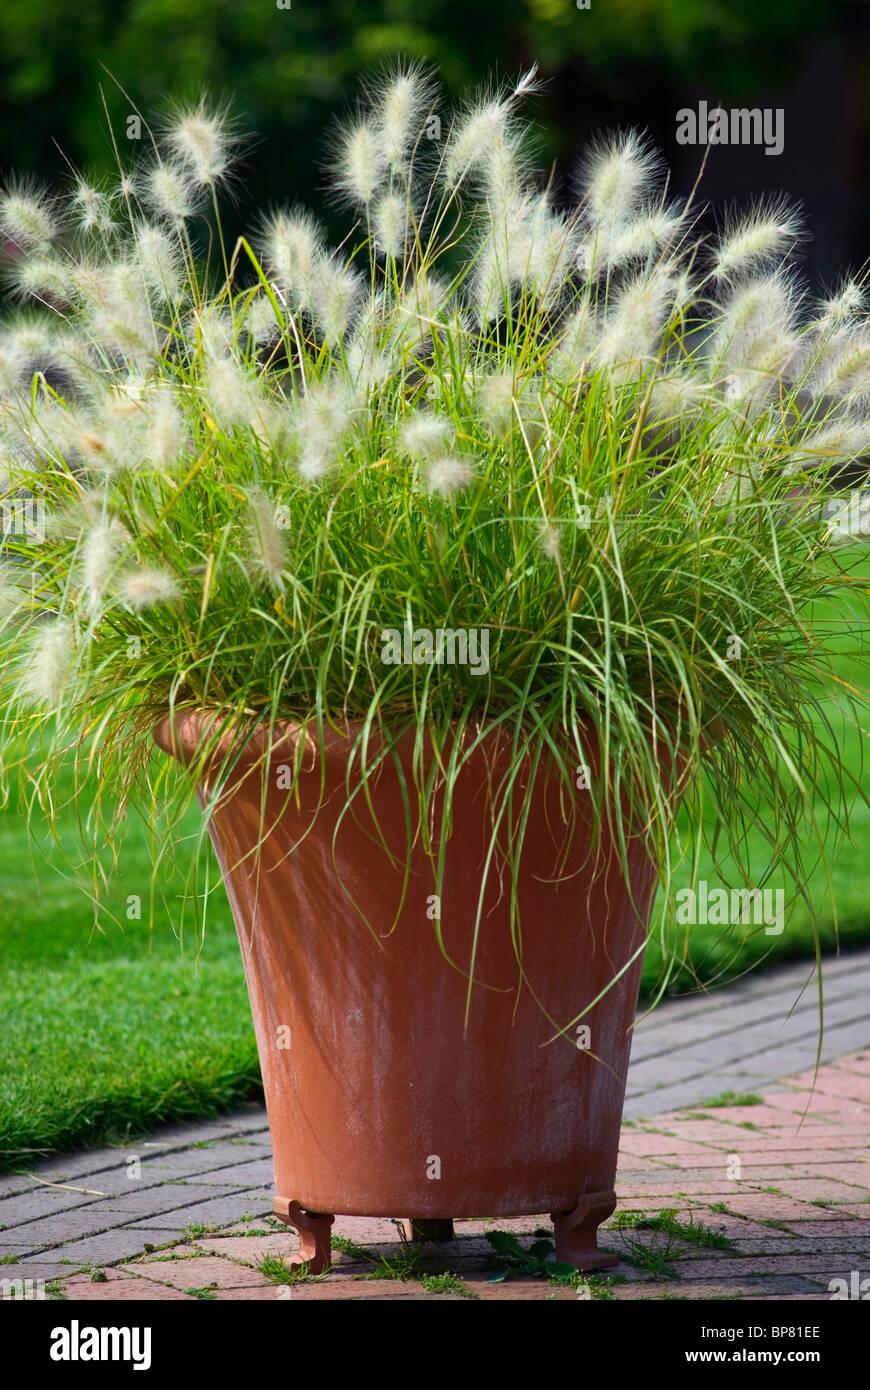 Pennisetum villosum feather top growing in clay pot stock photo royalty free image 30909606 - Graminees en pot ...